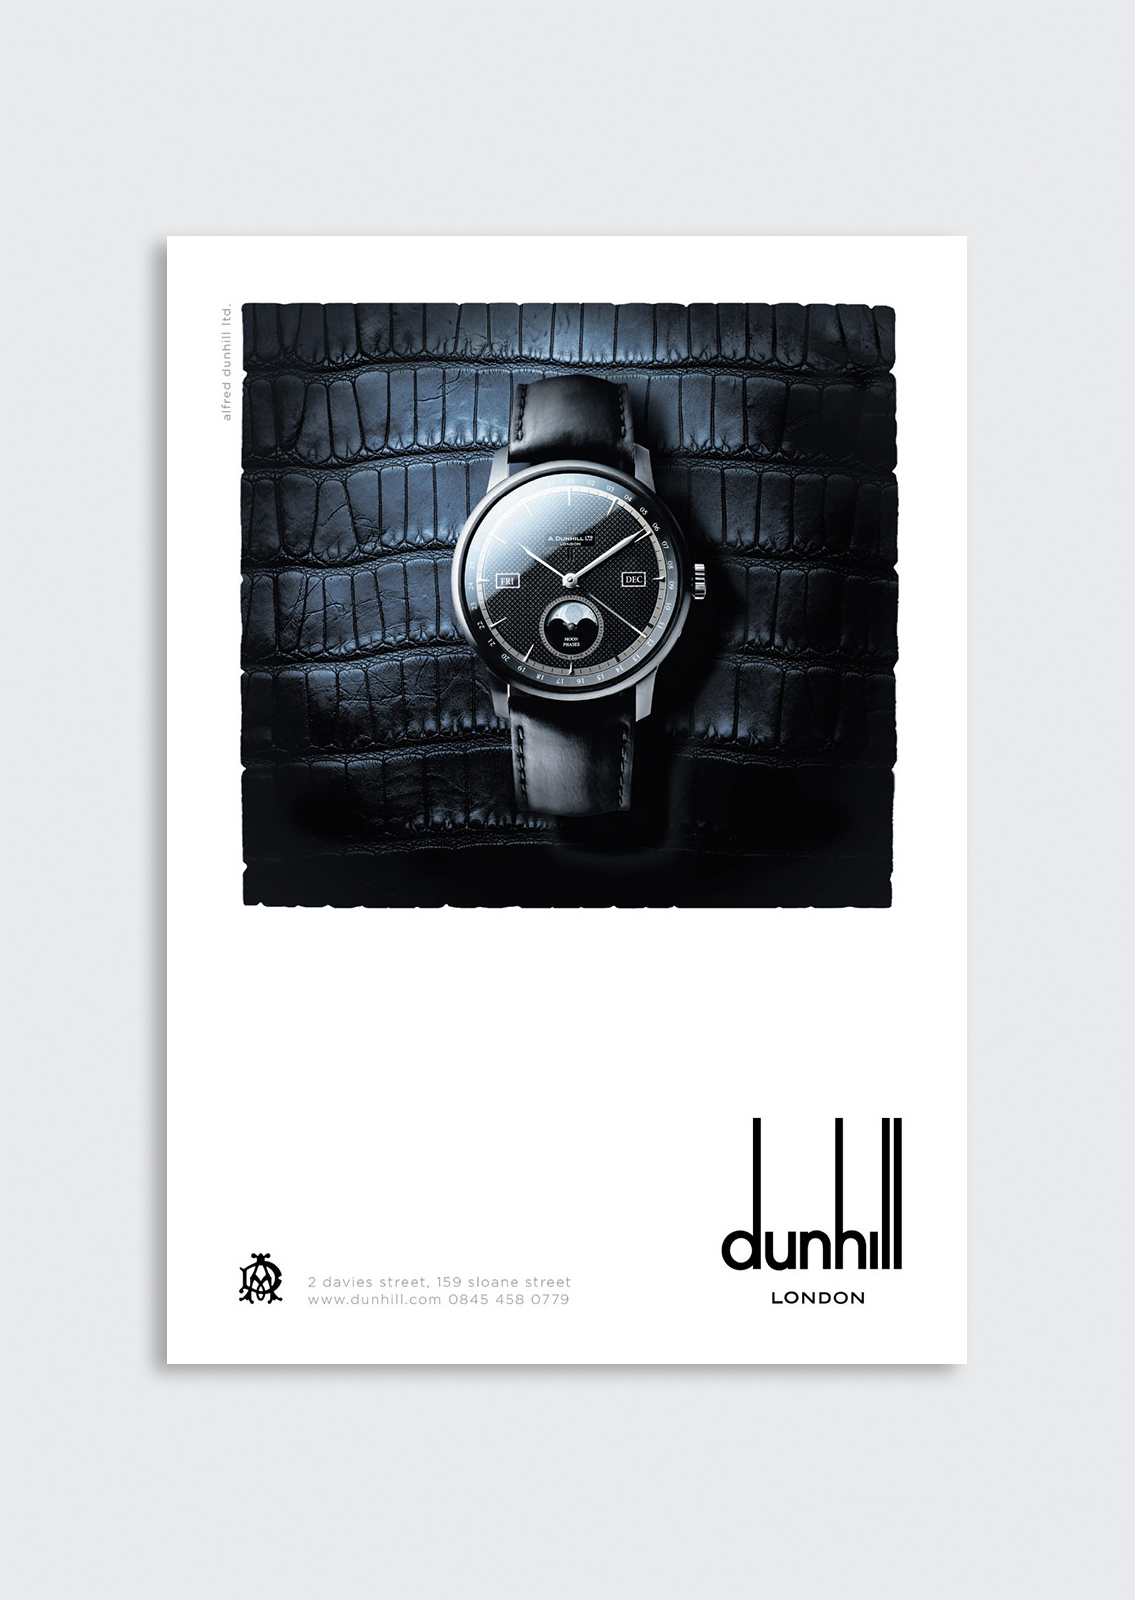 Dunhill-Portfolio-Image-14 2 Grey.jpg